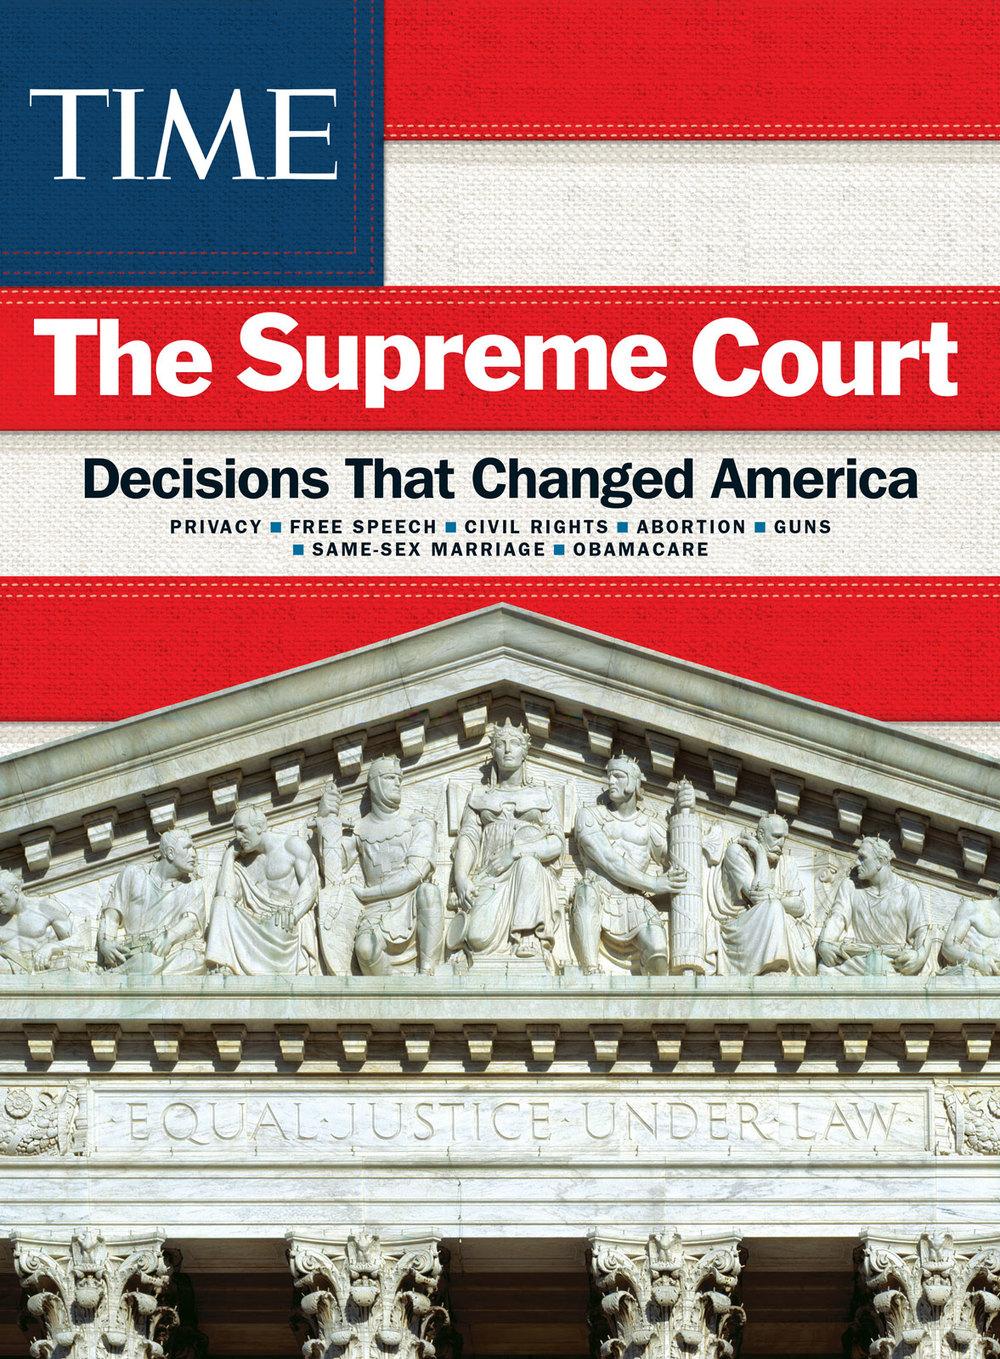 SCOTUS_cover.jpg